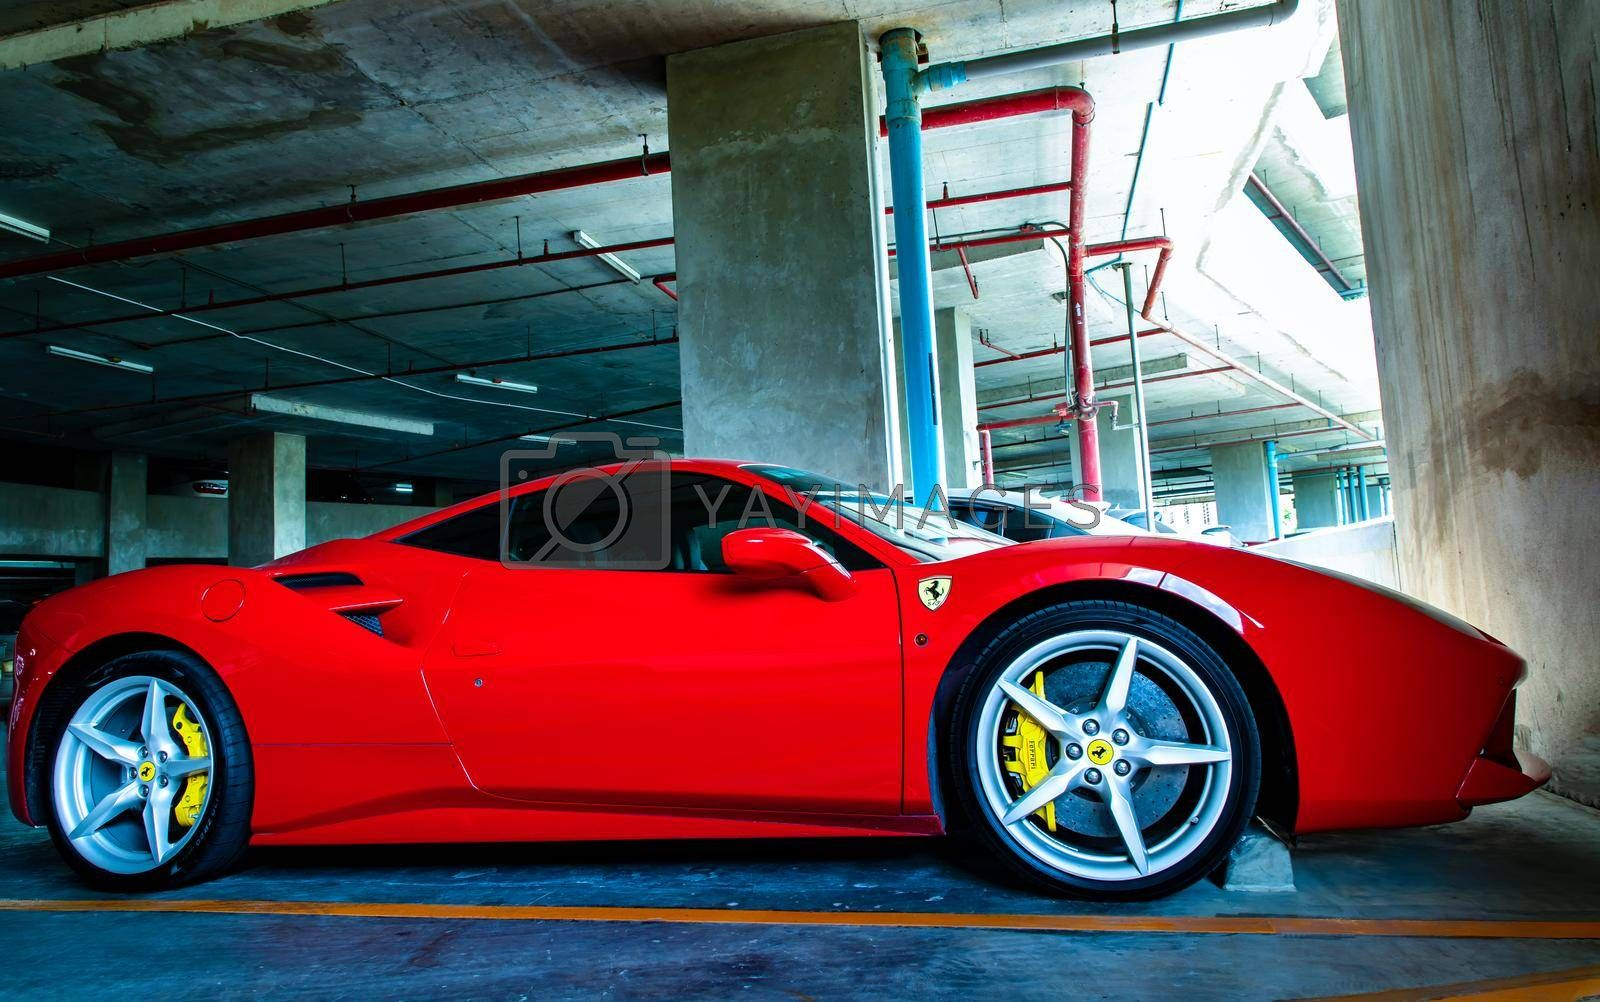 Bangkok, Thailand - 06 Jun 2021 : Side view of Red metallic Ferrari car in the parking lot. Ferrari is Italian sports car. Selective focus.